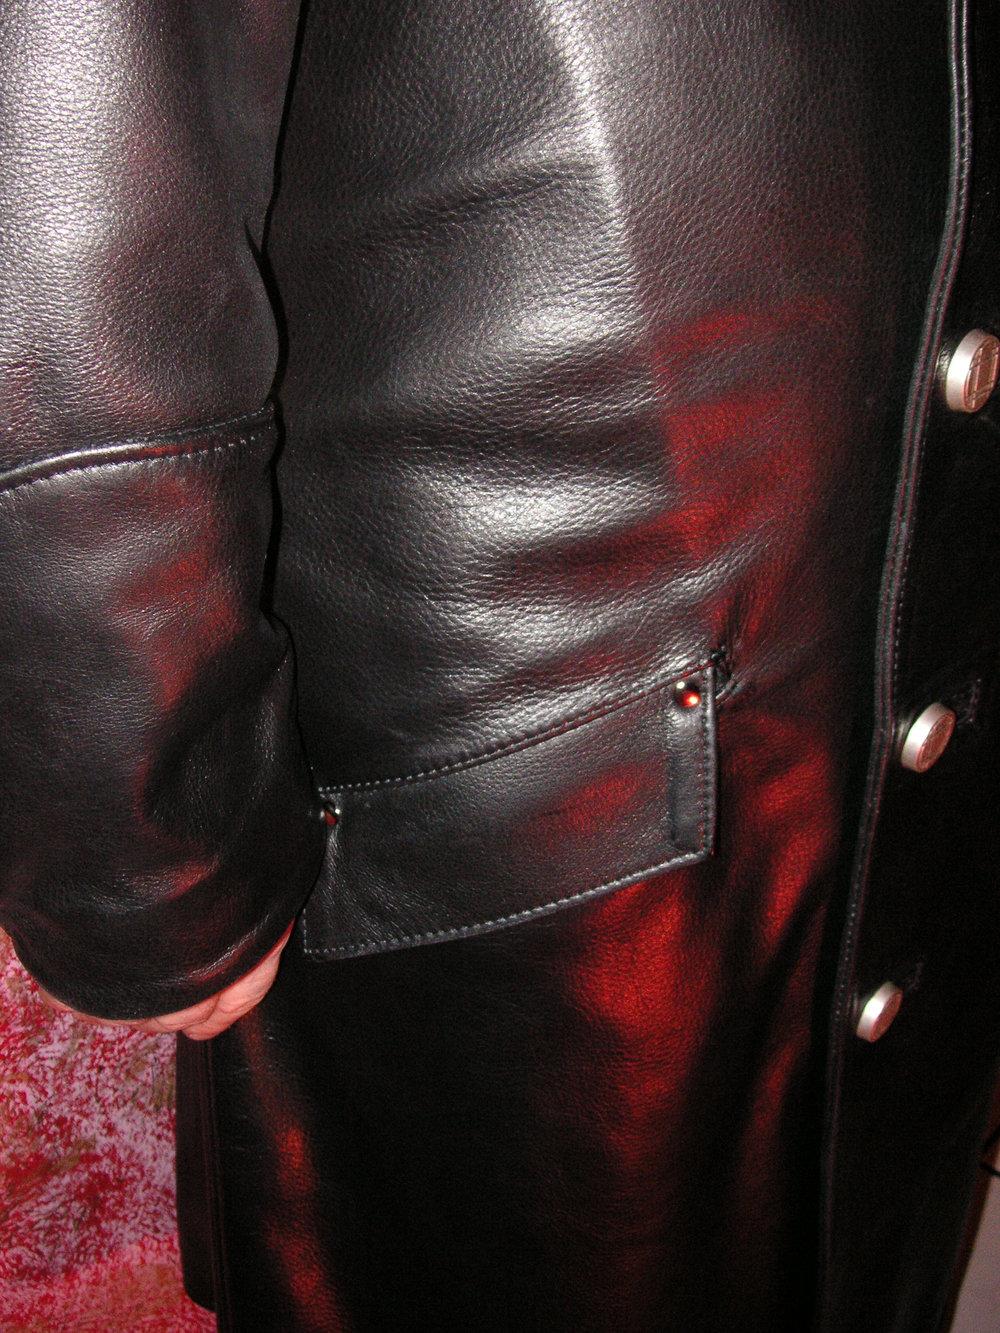 ron-leather-7.jpg